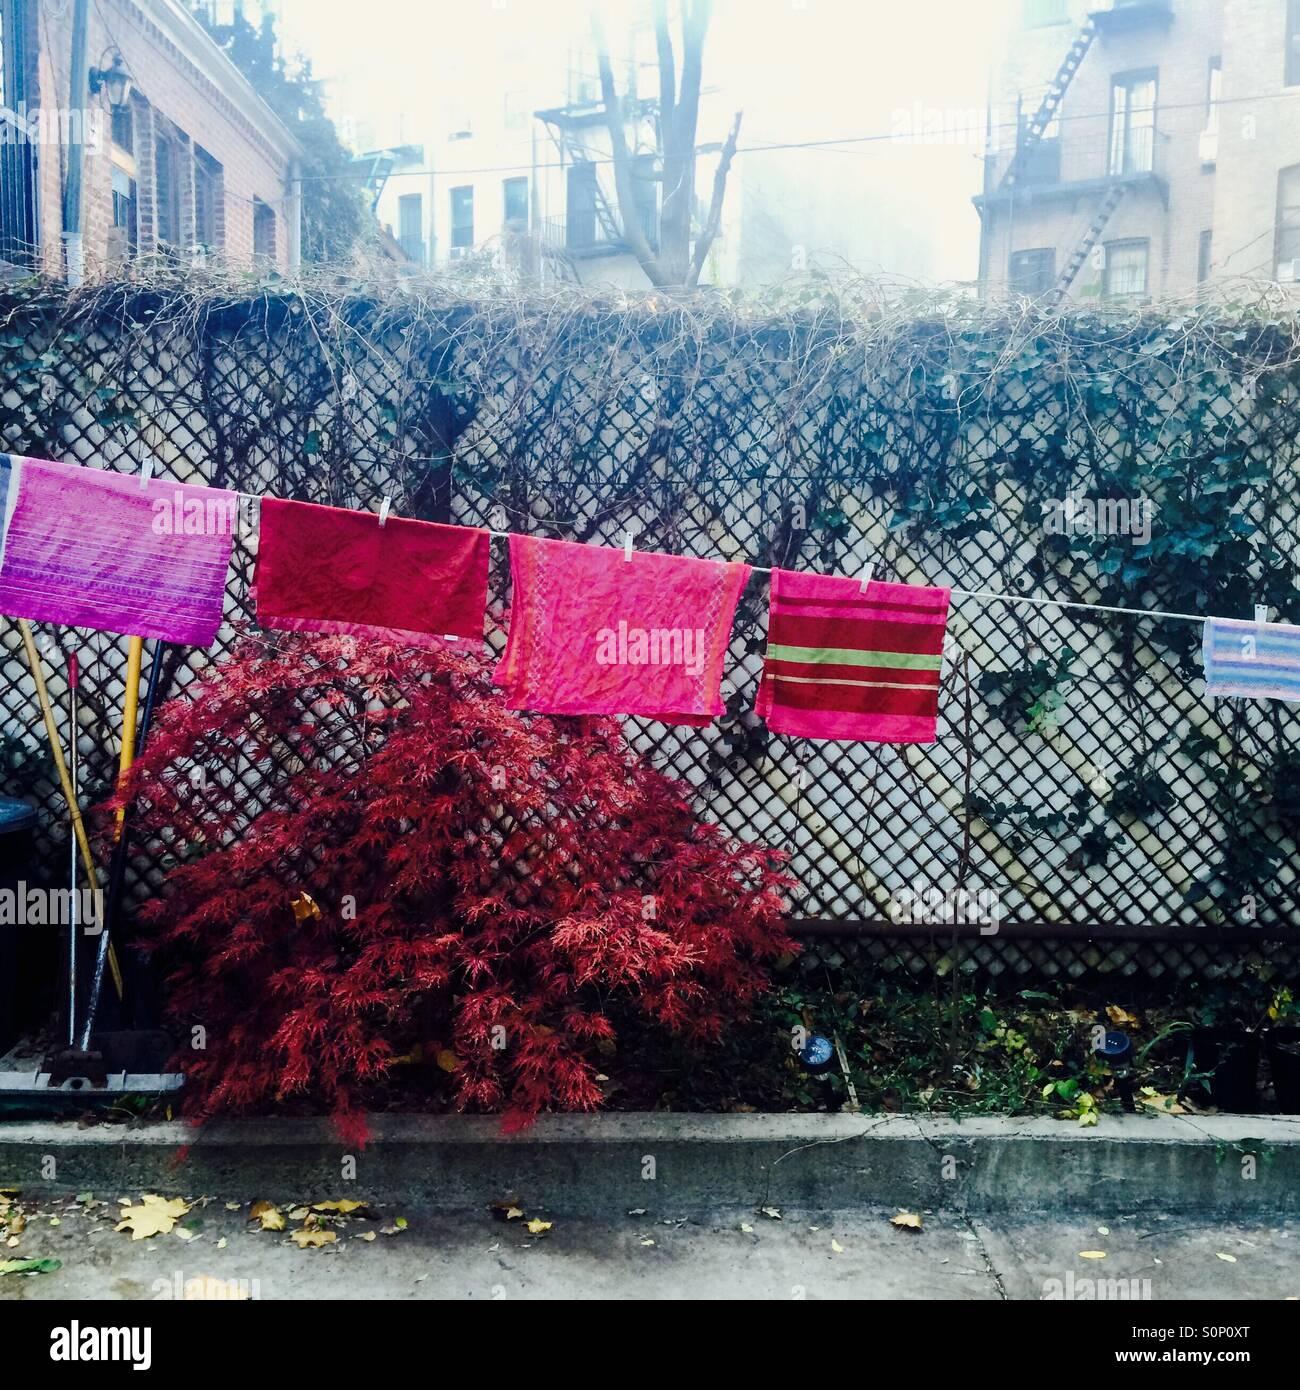 crimson laundry, red dwarf maple - Stock Image